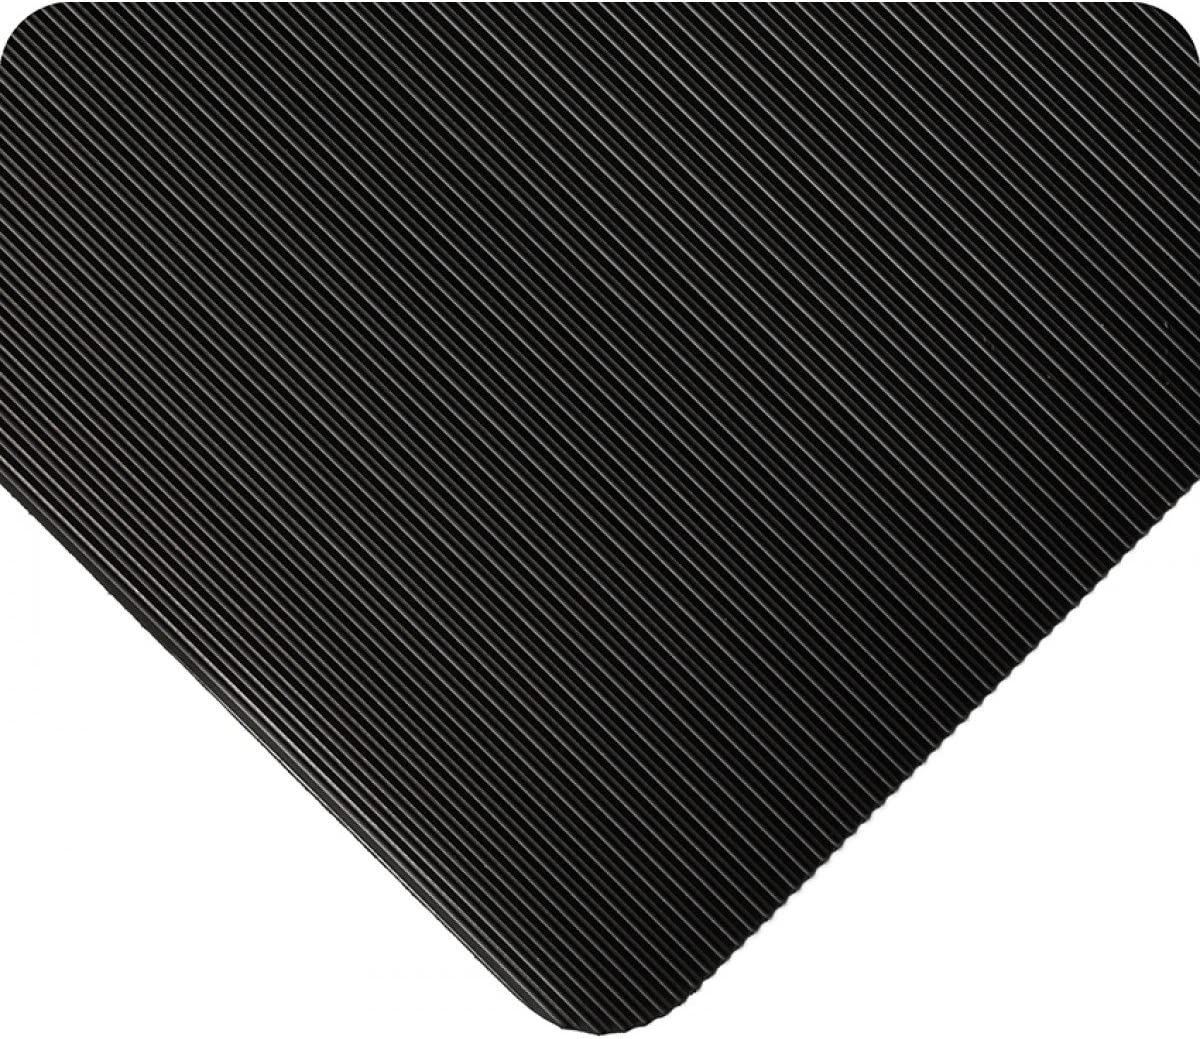 Standard Long-awaited Corrugated Vinyl Runner 3' 110' x Black Mat Floor low-pricing